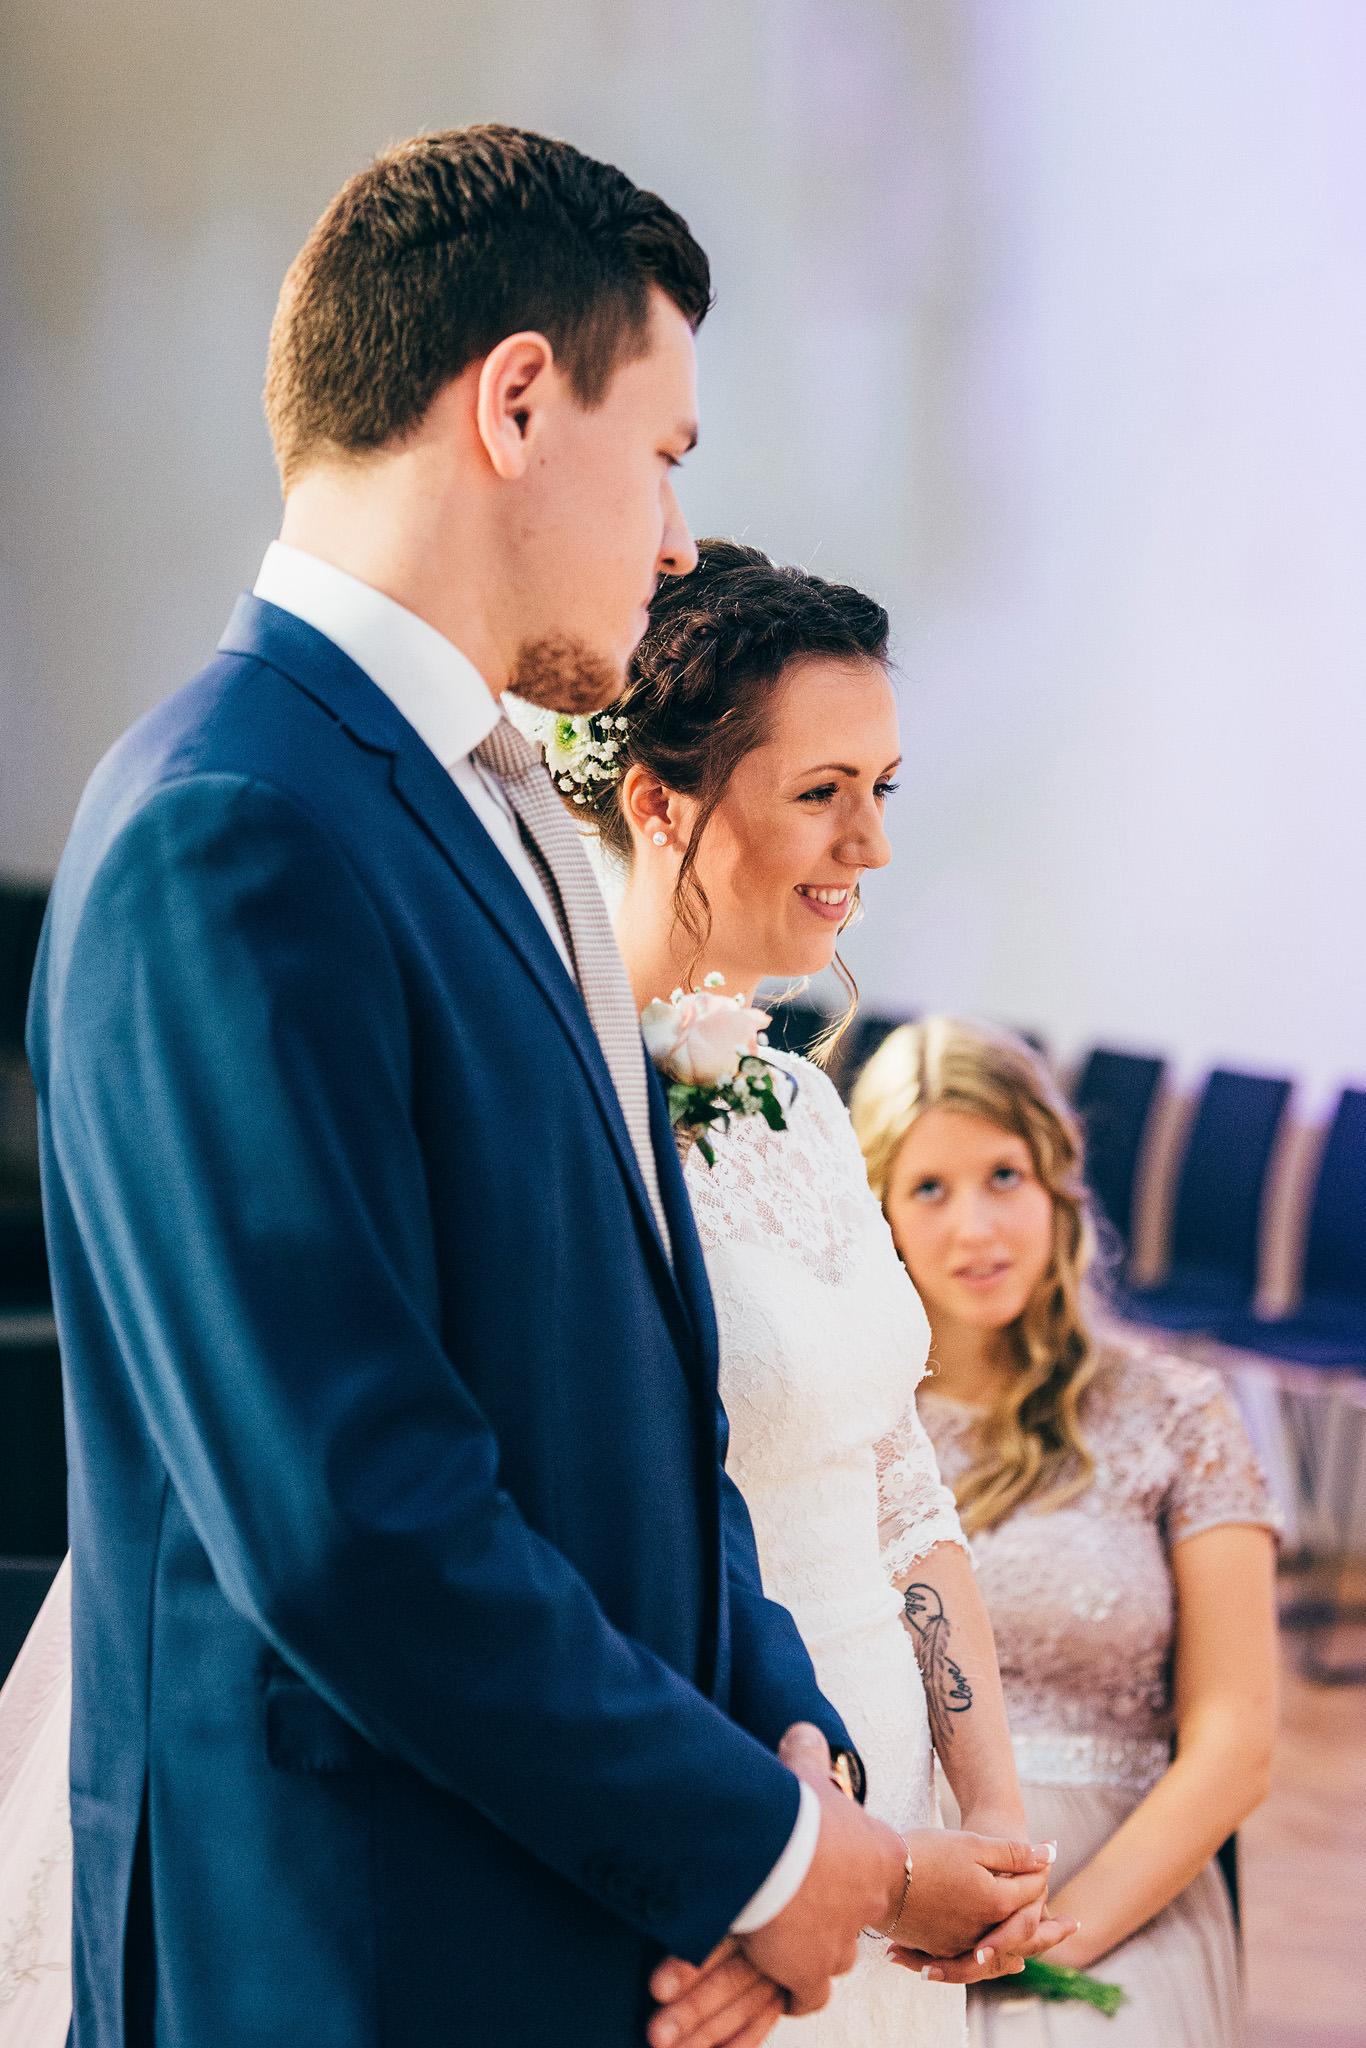 Norway+wedding+photographer+elopement+pre+wedding+Casey+Arneson-38.jpg